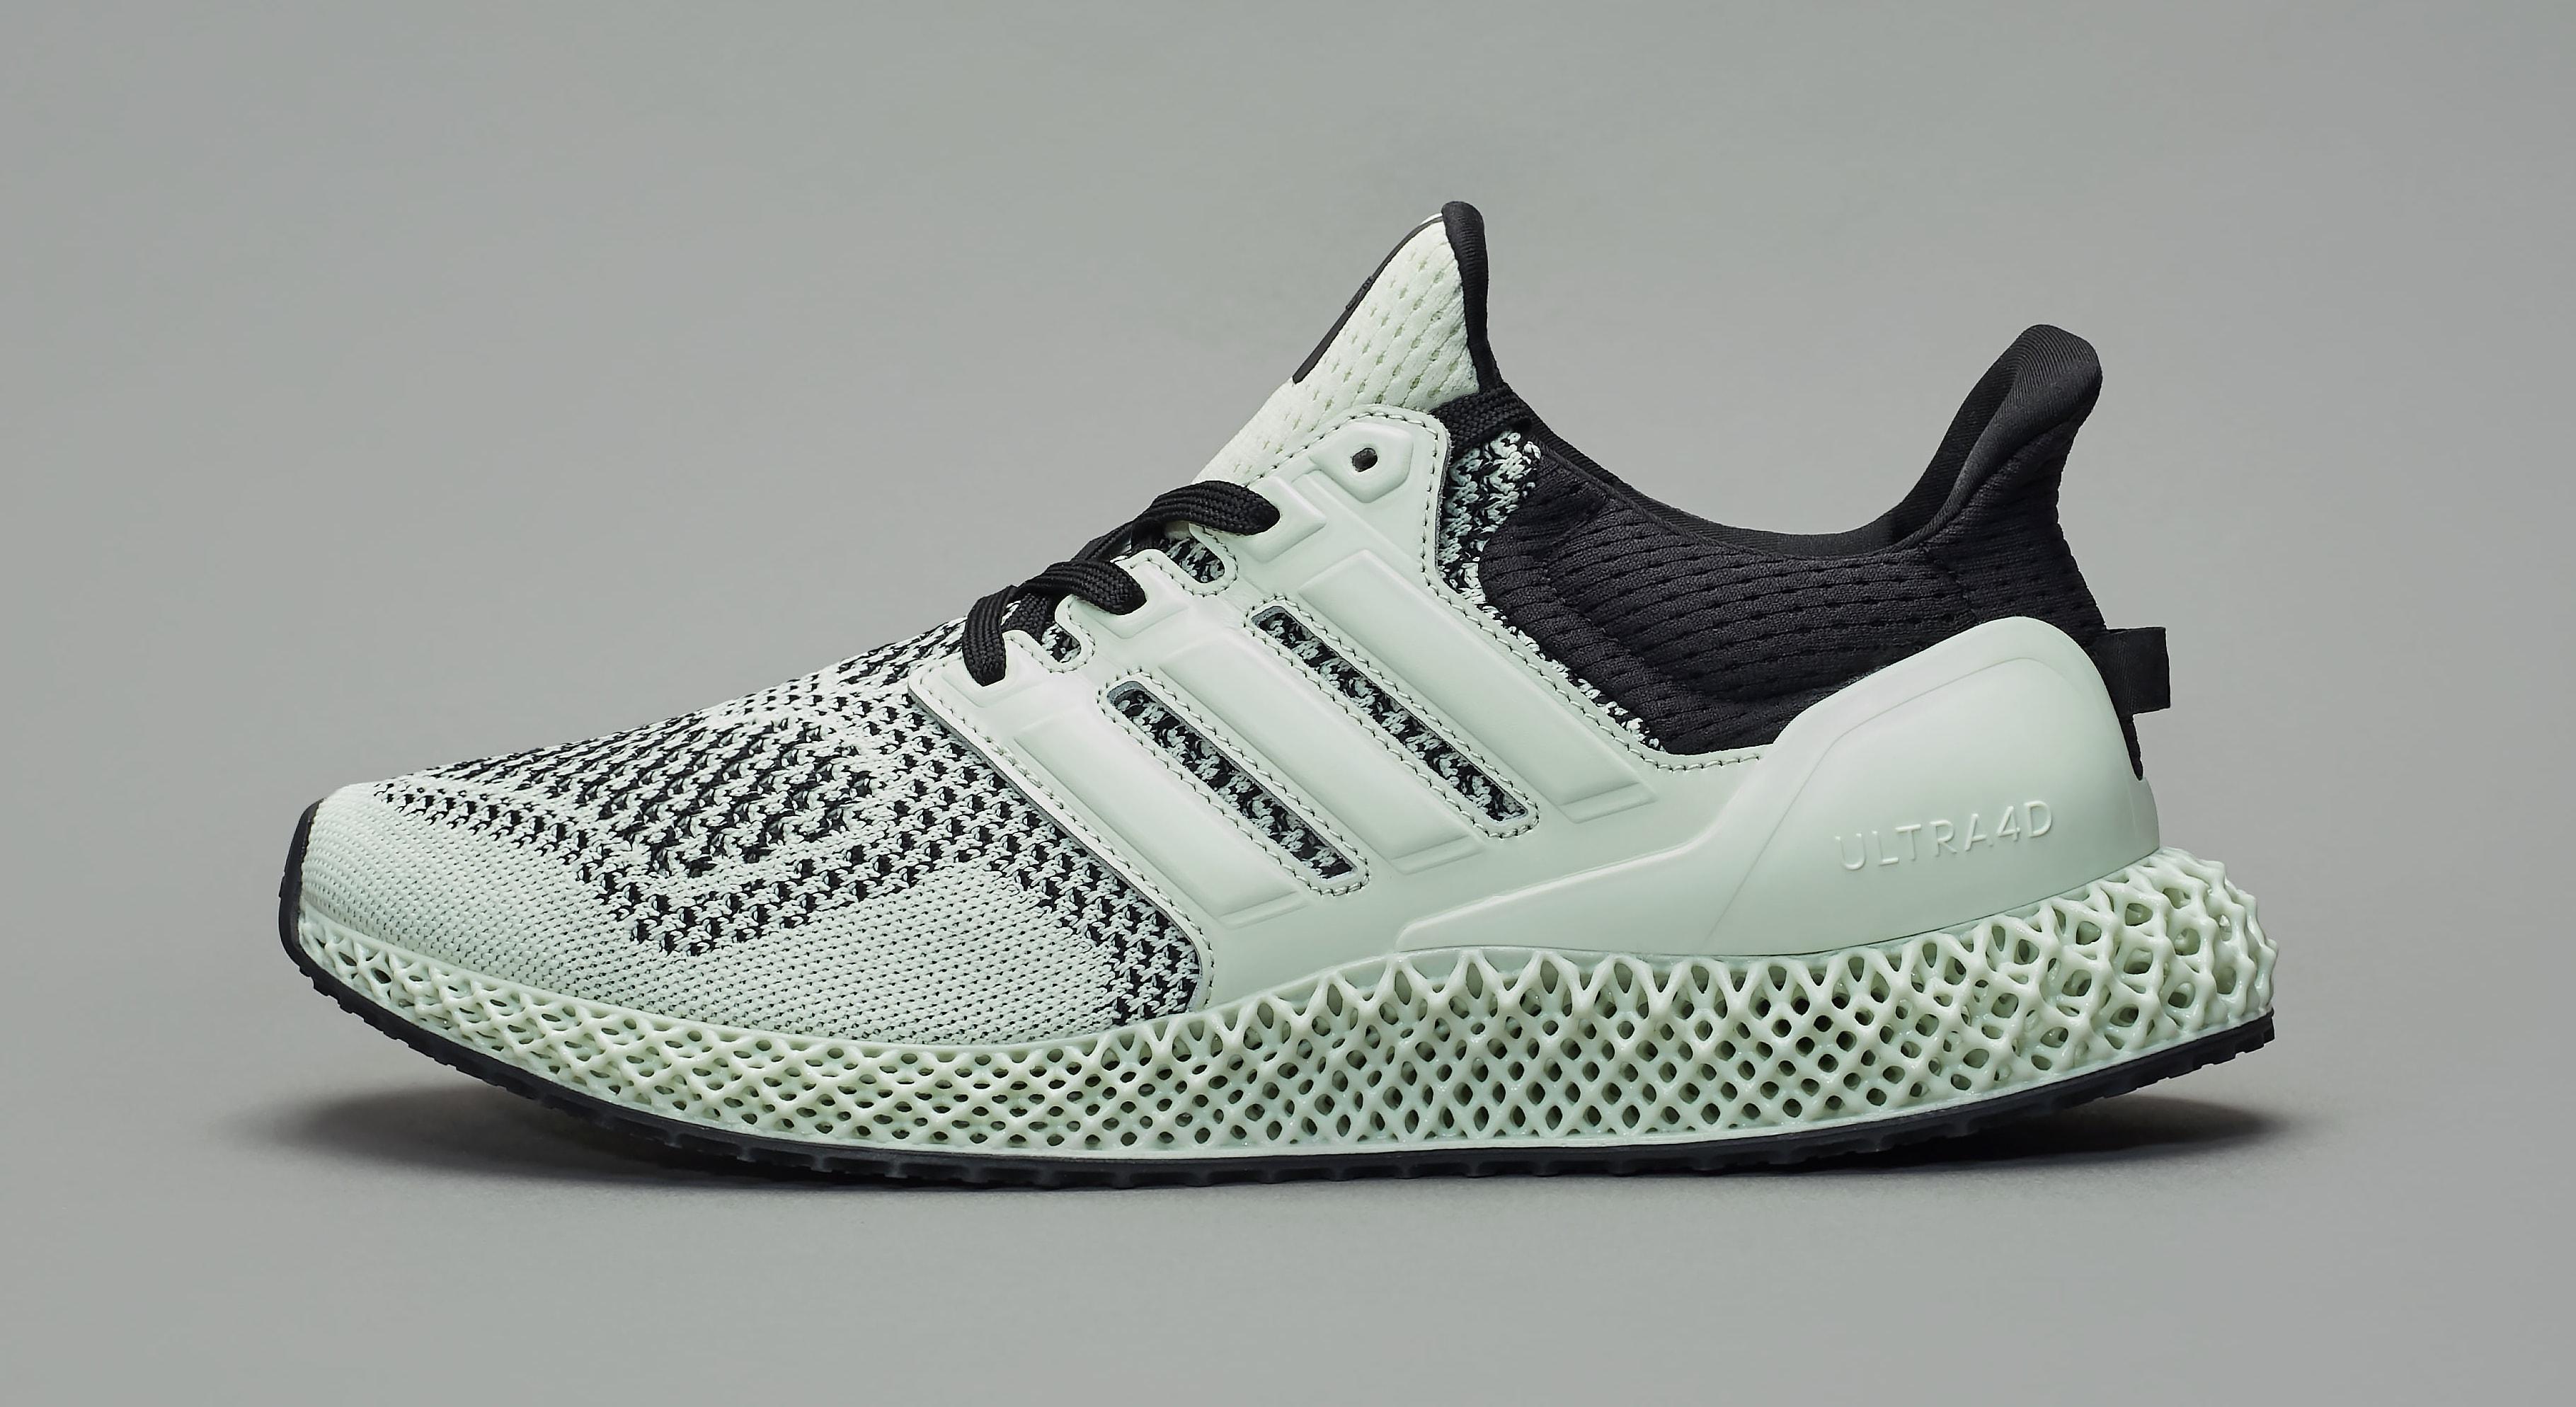 Sneakersnstuff x Adidas Ultra 4D 'Green Teatime' Medial